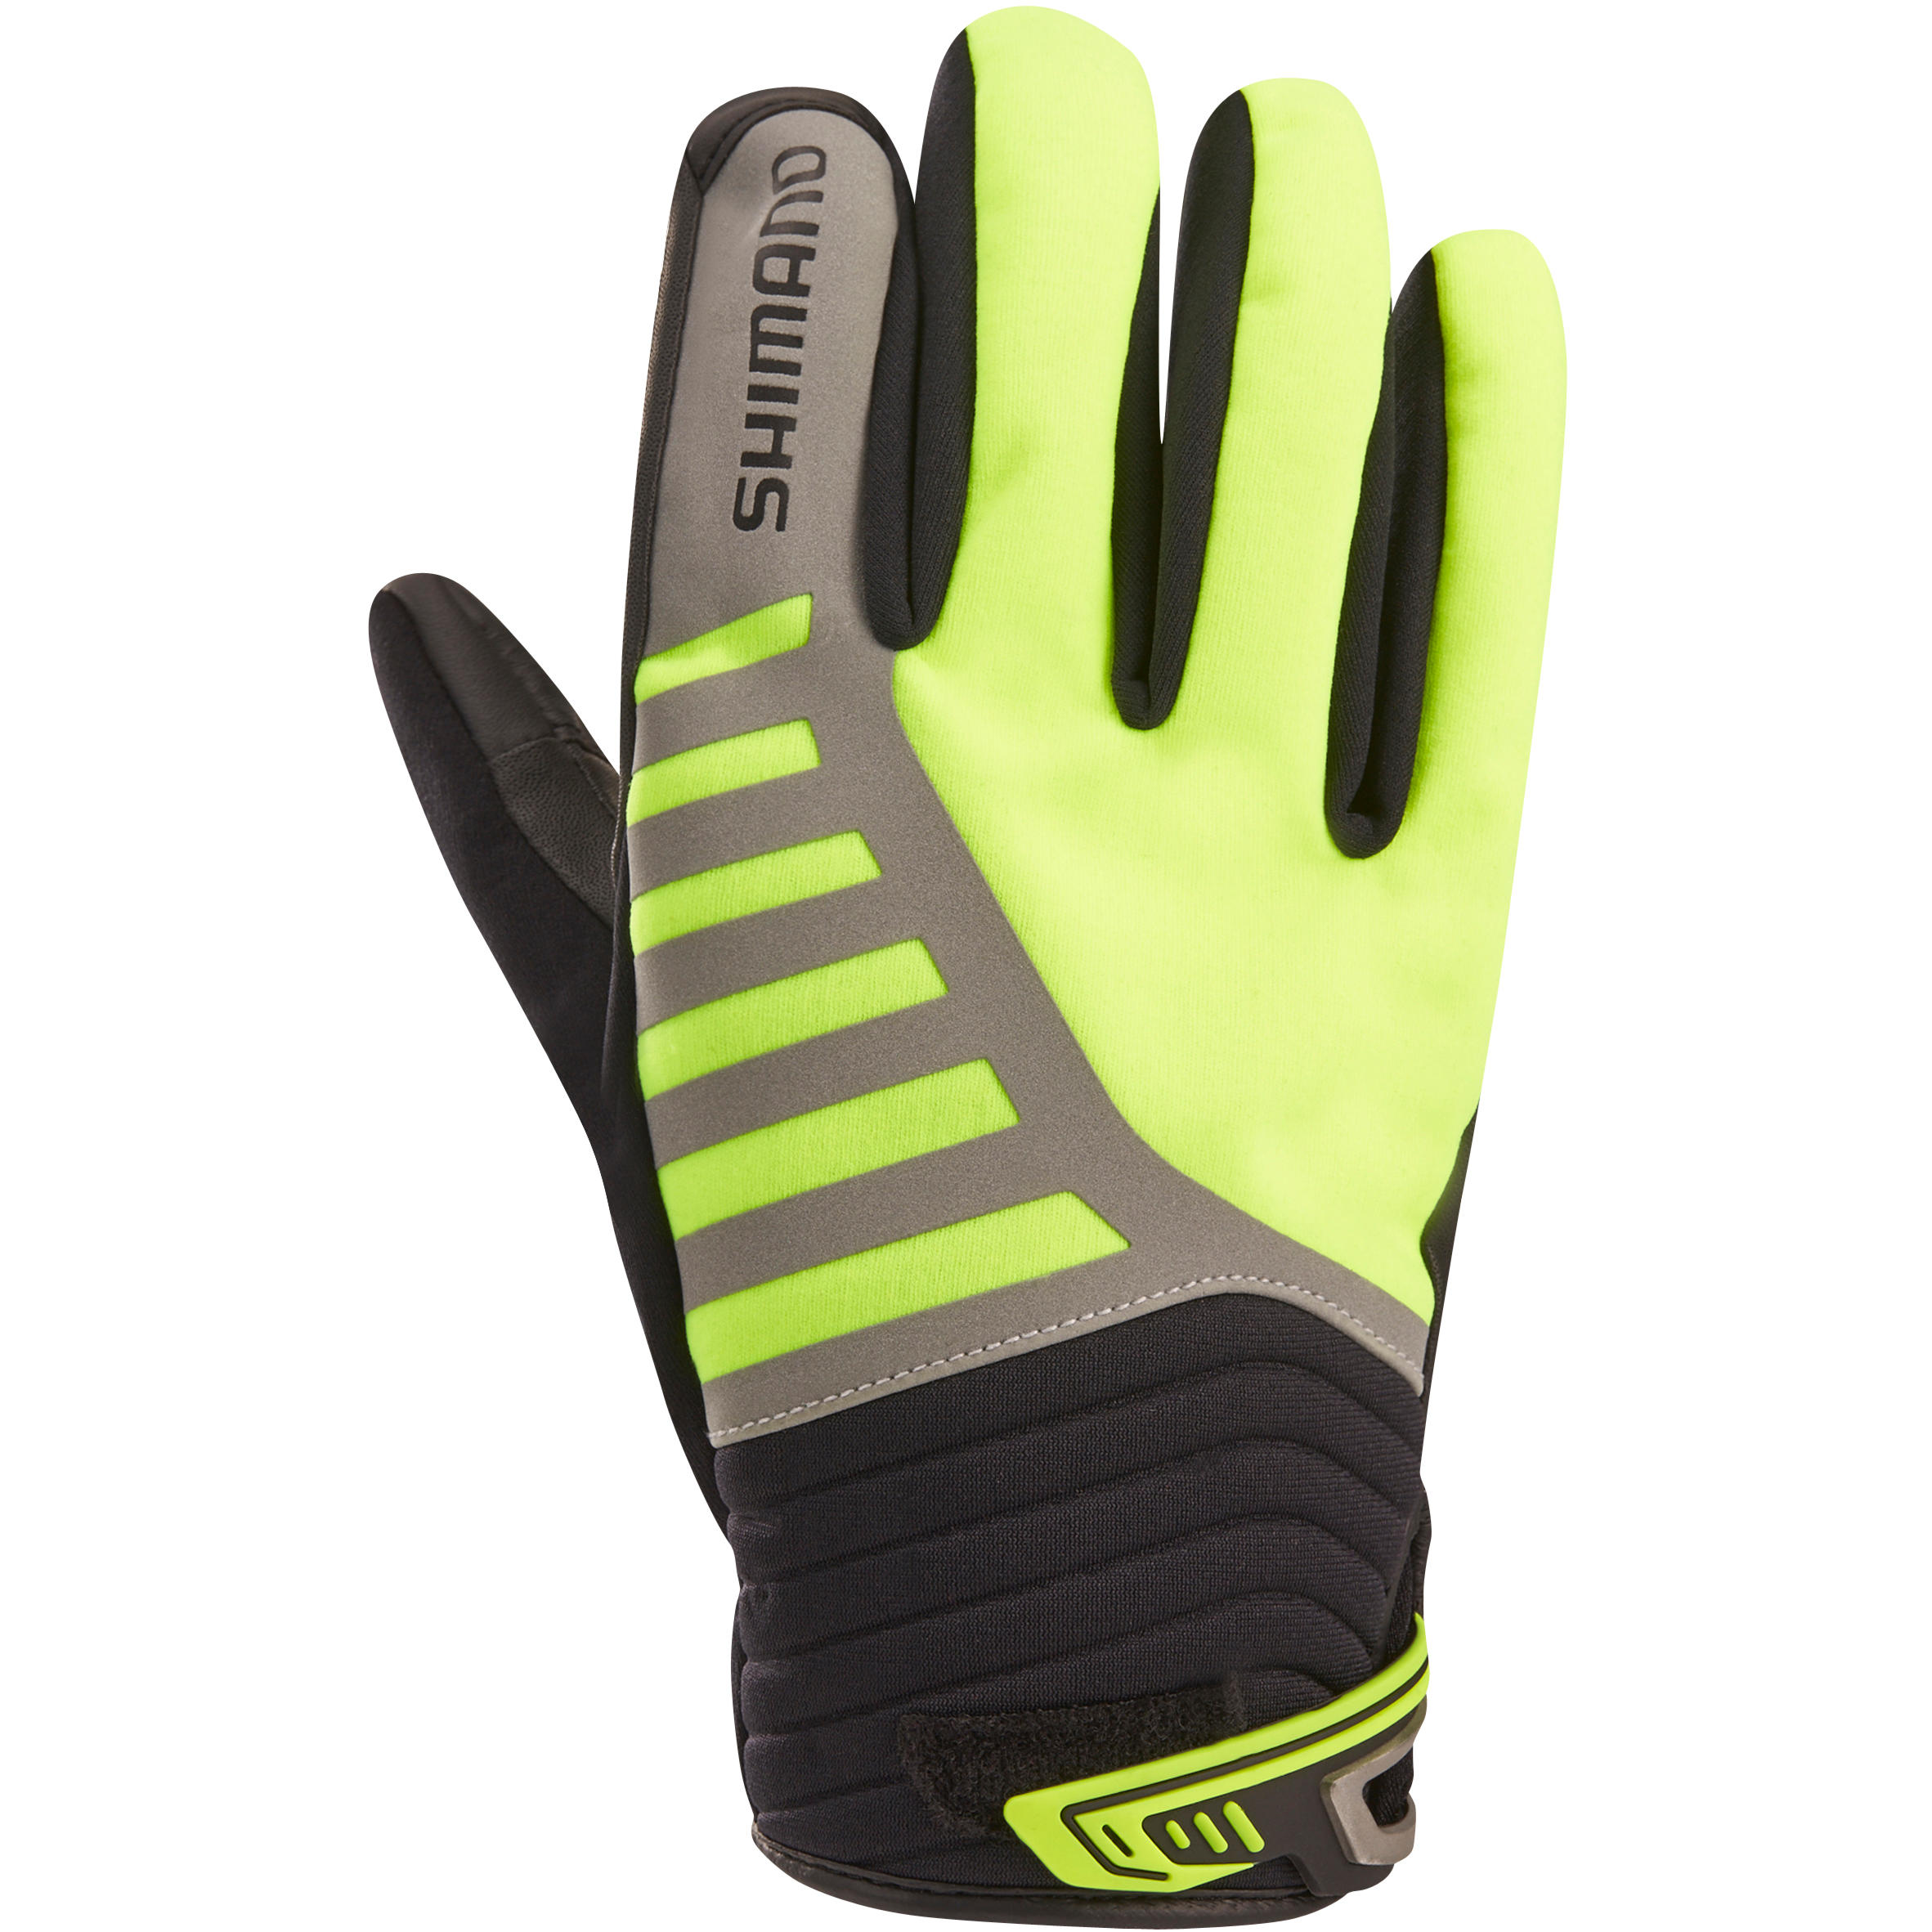 Shimano Handschoenen All Condition TH